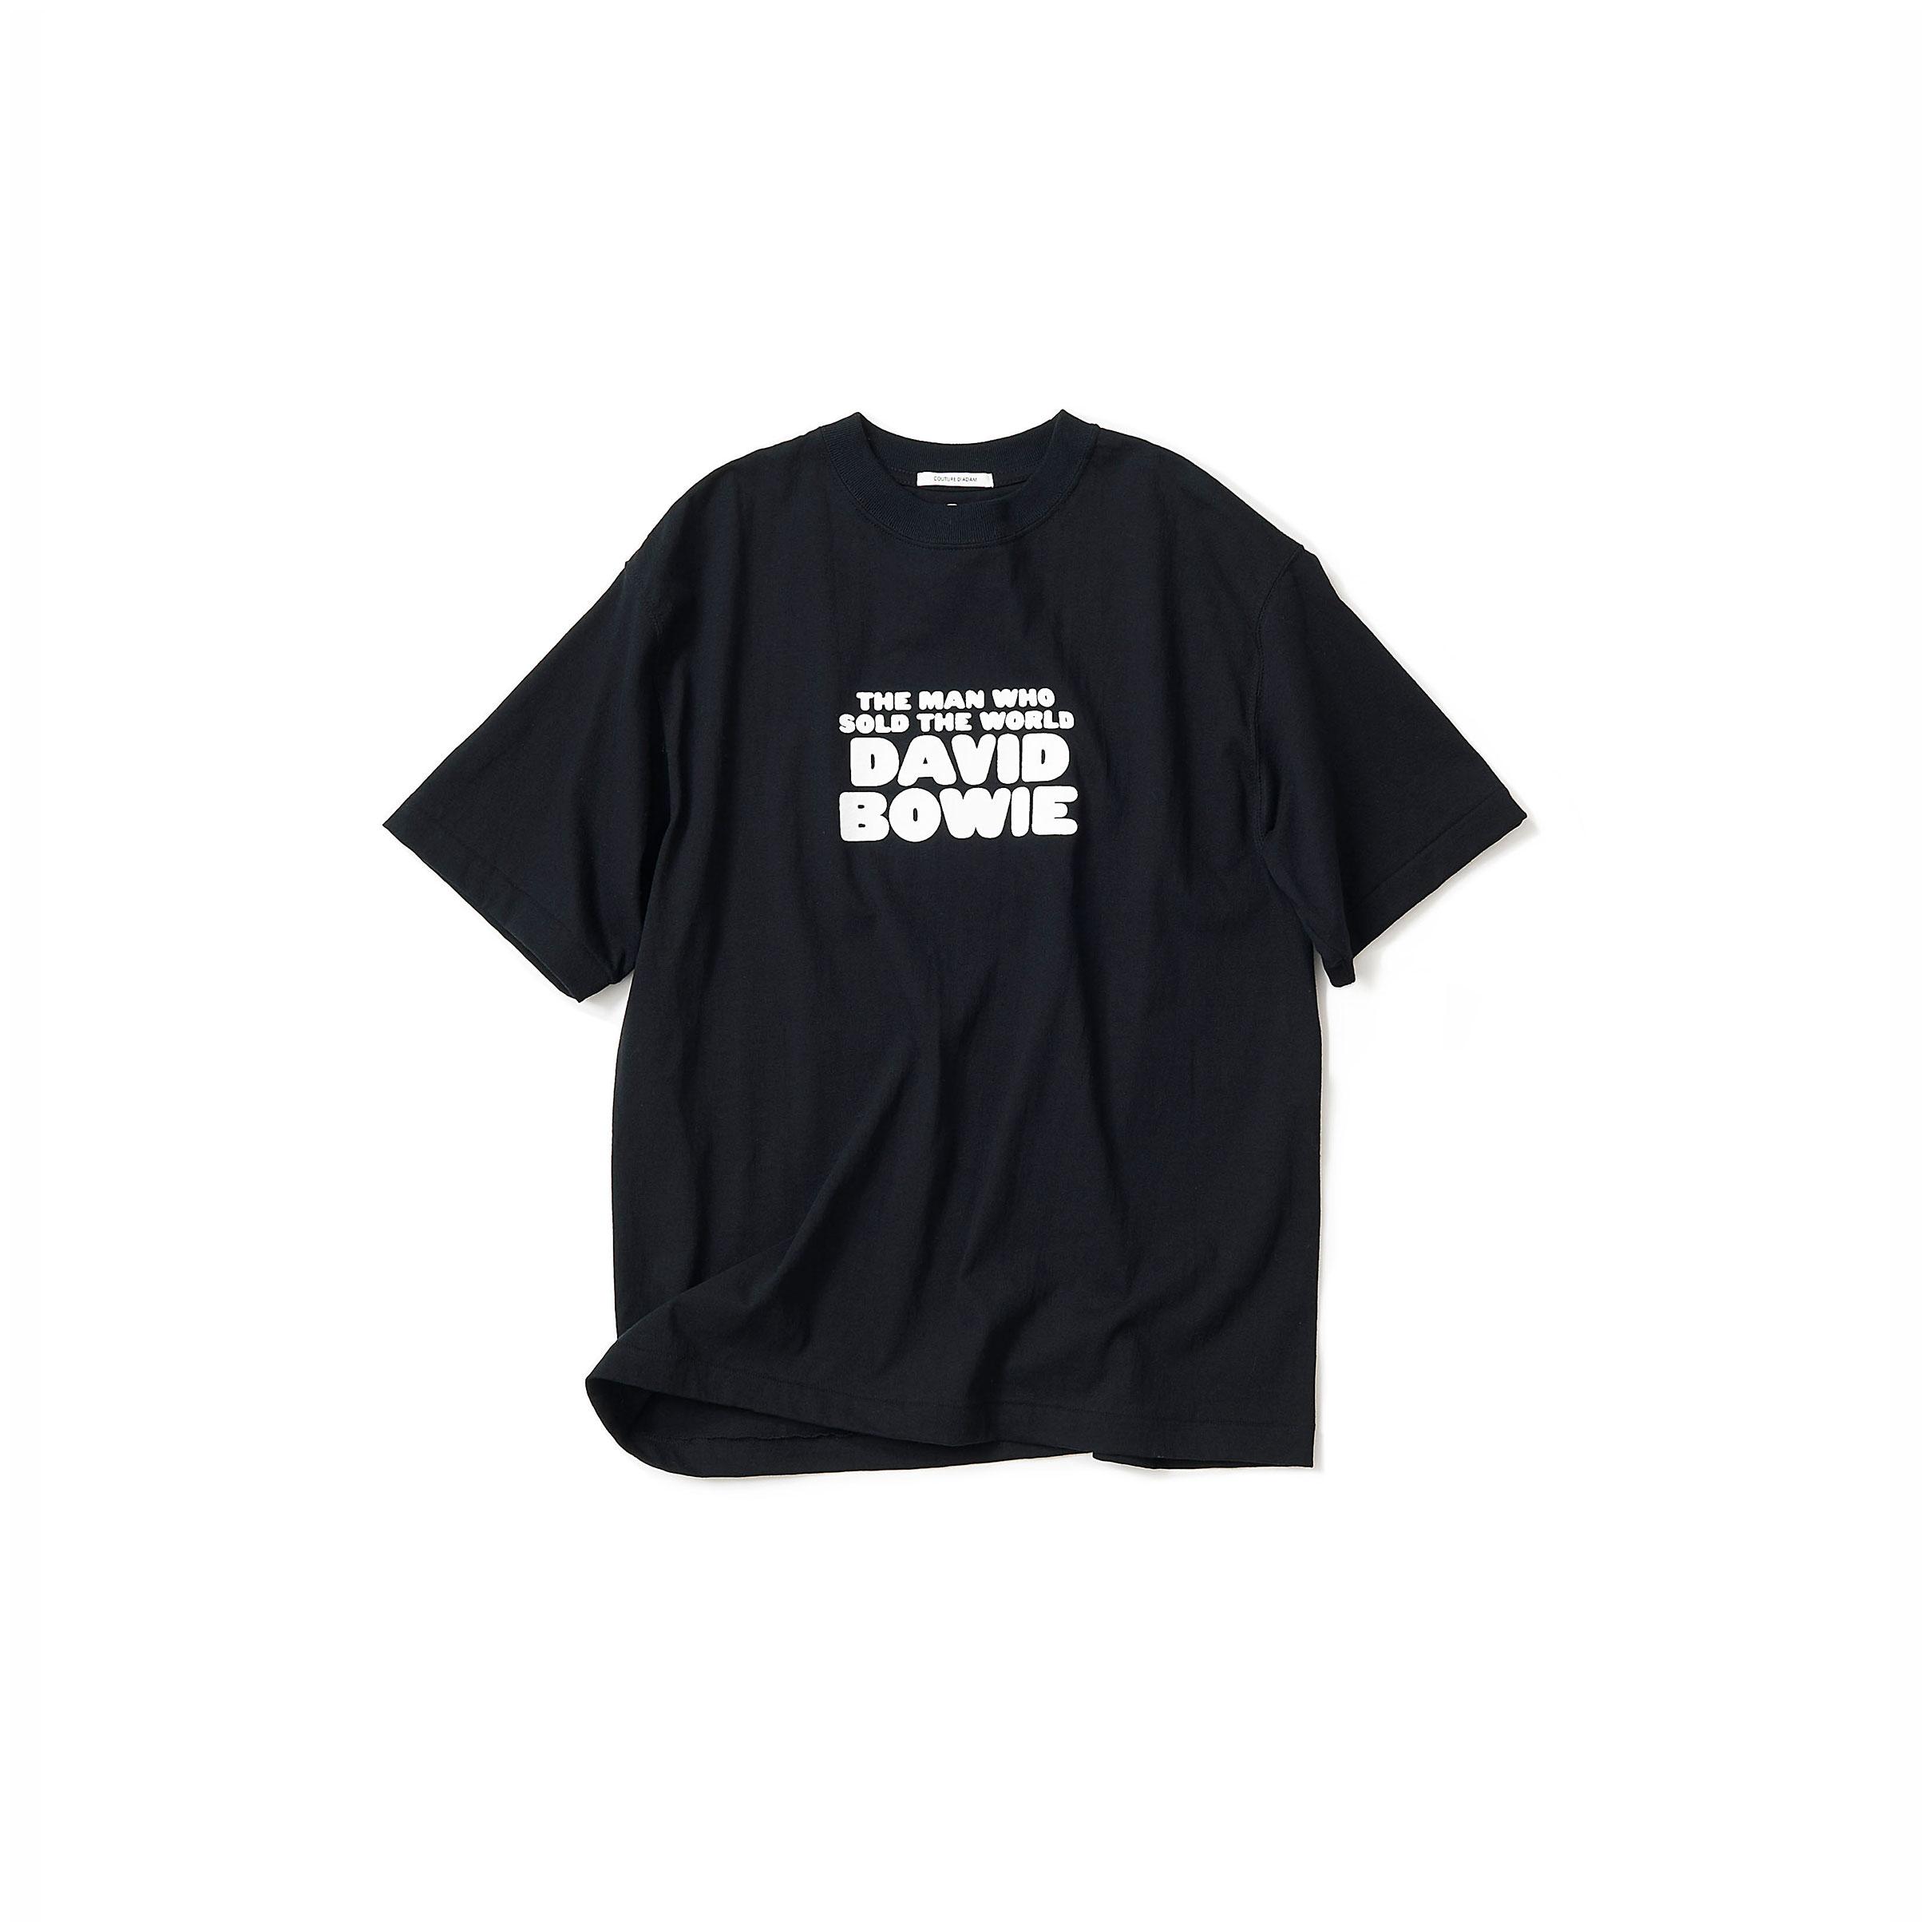 David Bowie  Tシャツ・black